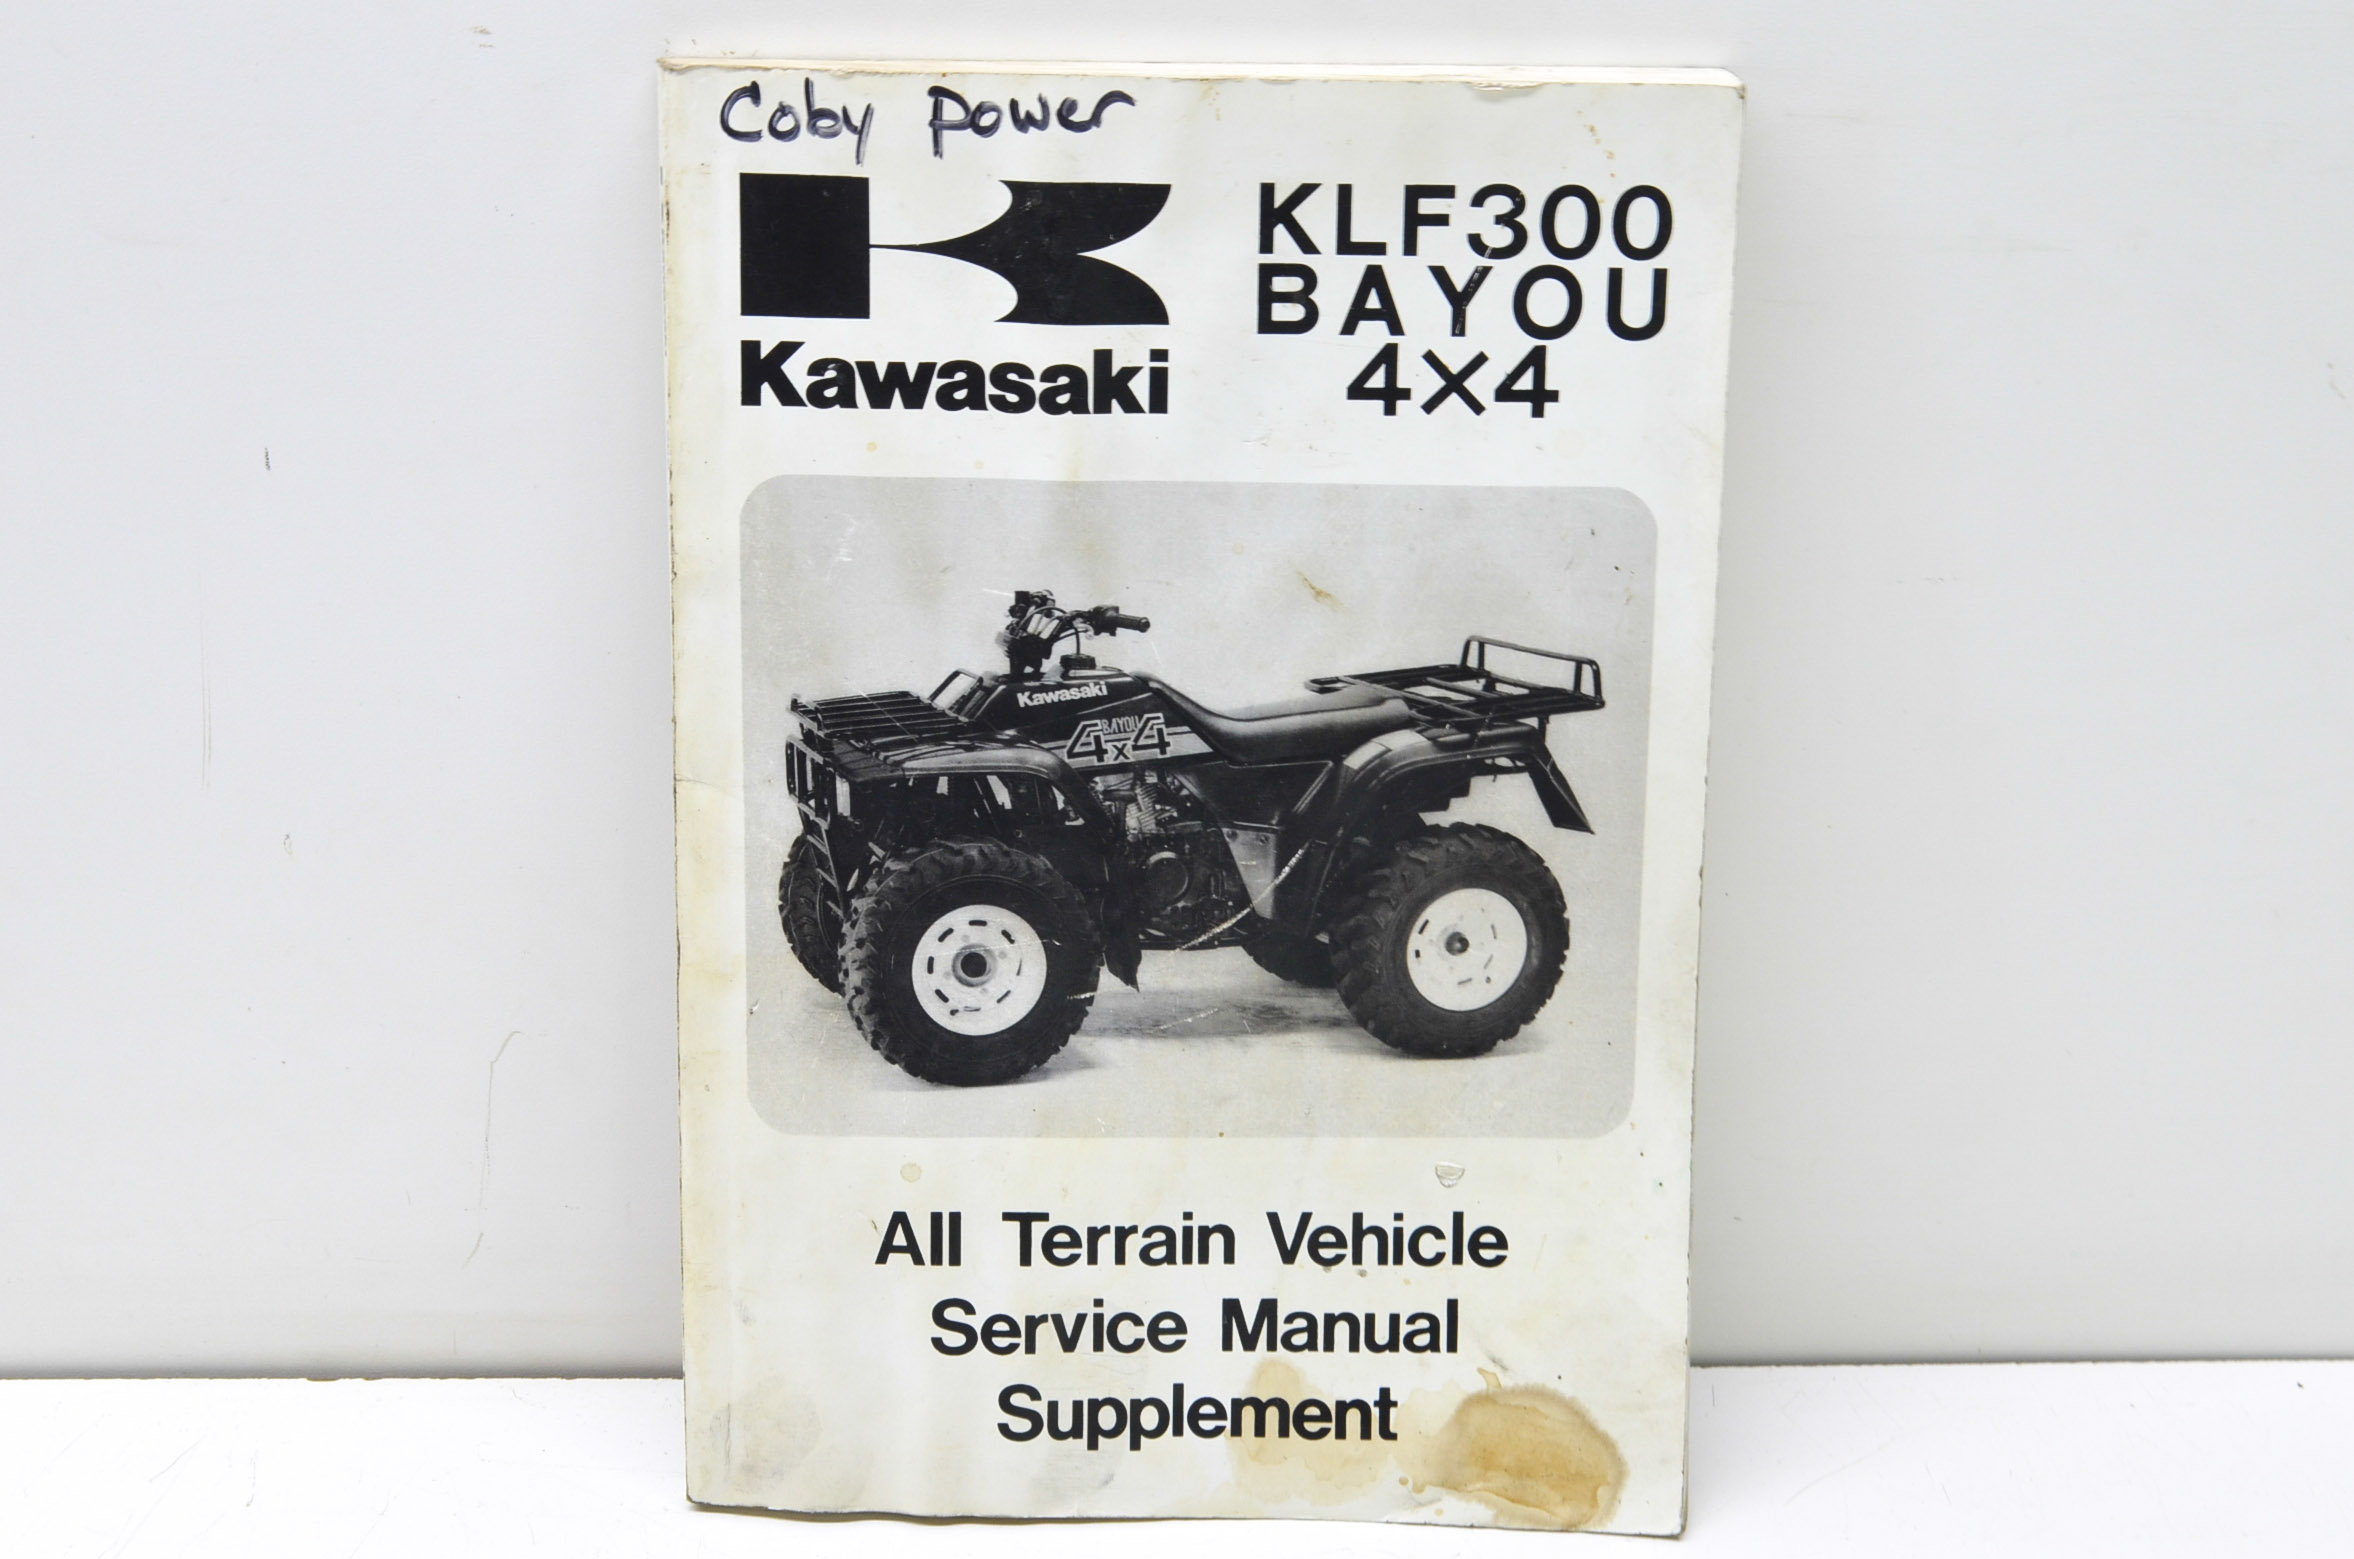 1989 Kawasaki KLF300 BAYOU 4X4 ATV Service Manual Supplement WORN STAINED DEAL